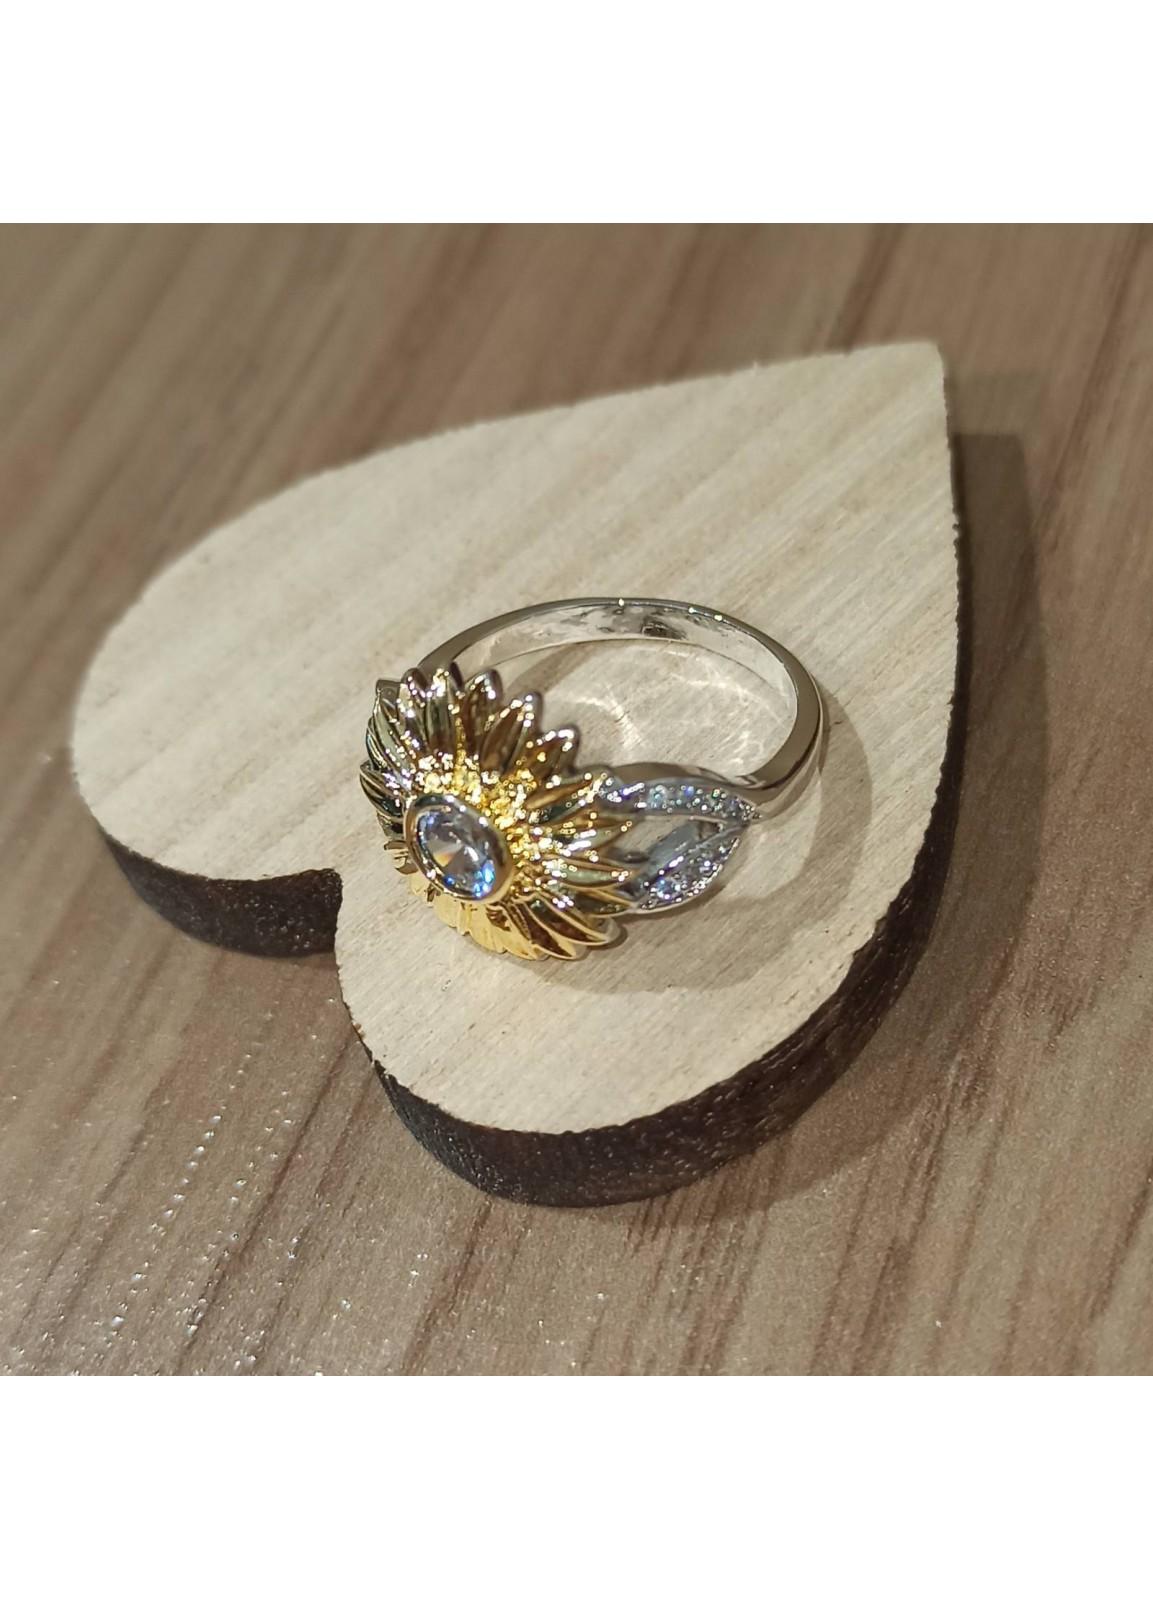 925 Silver Flower Ring